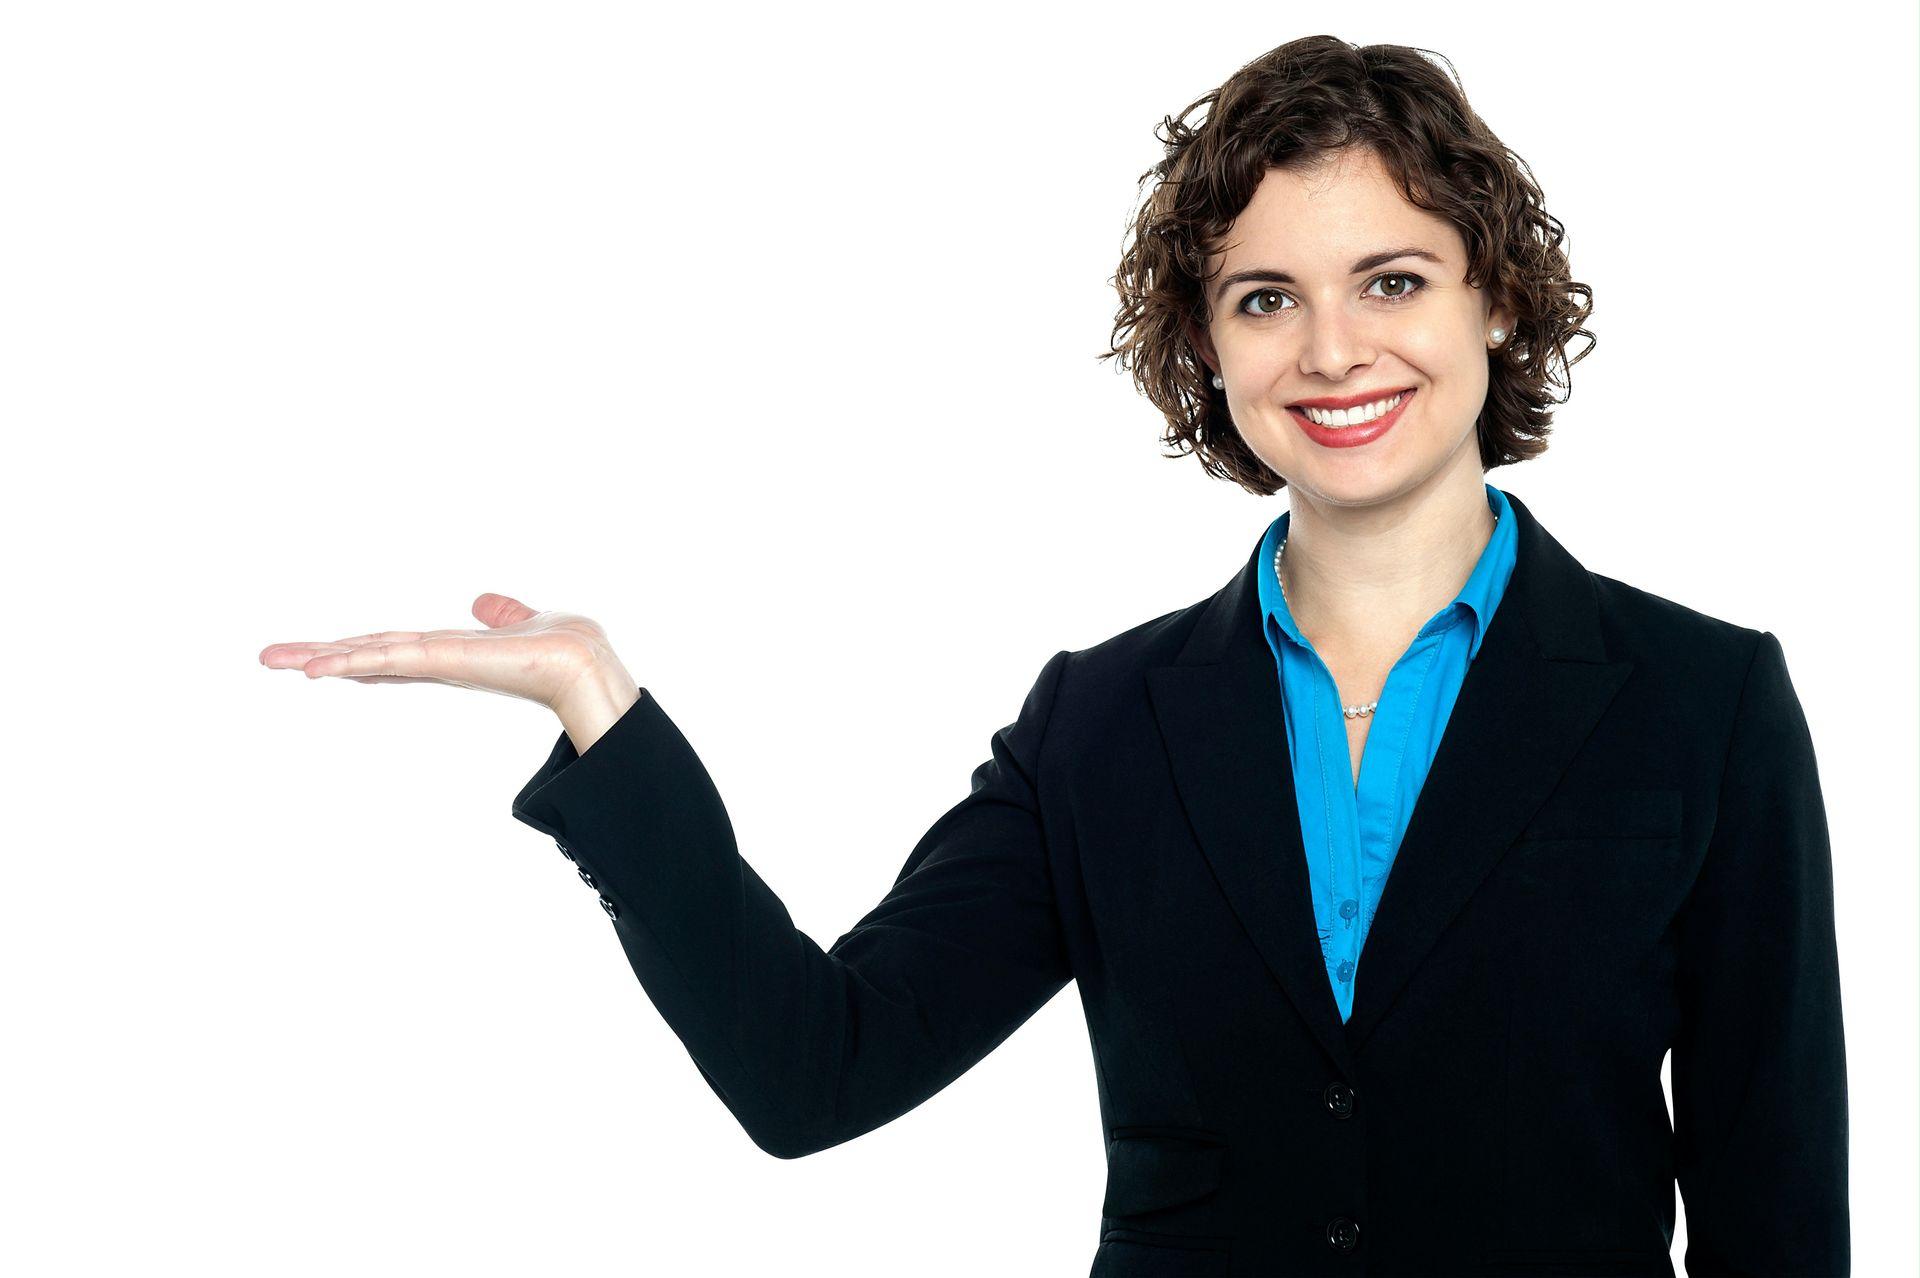 Do-it-yourself Loan – When You Should Get A Loan